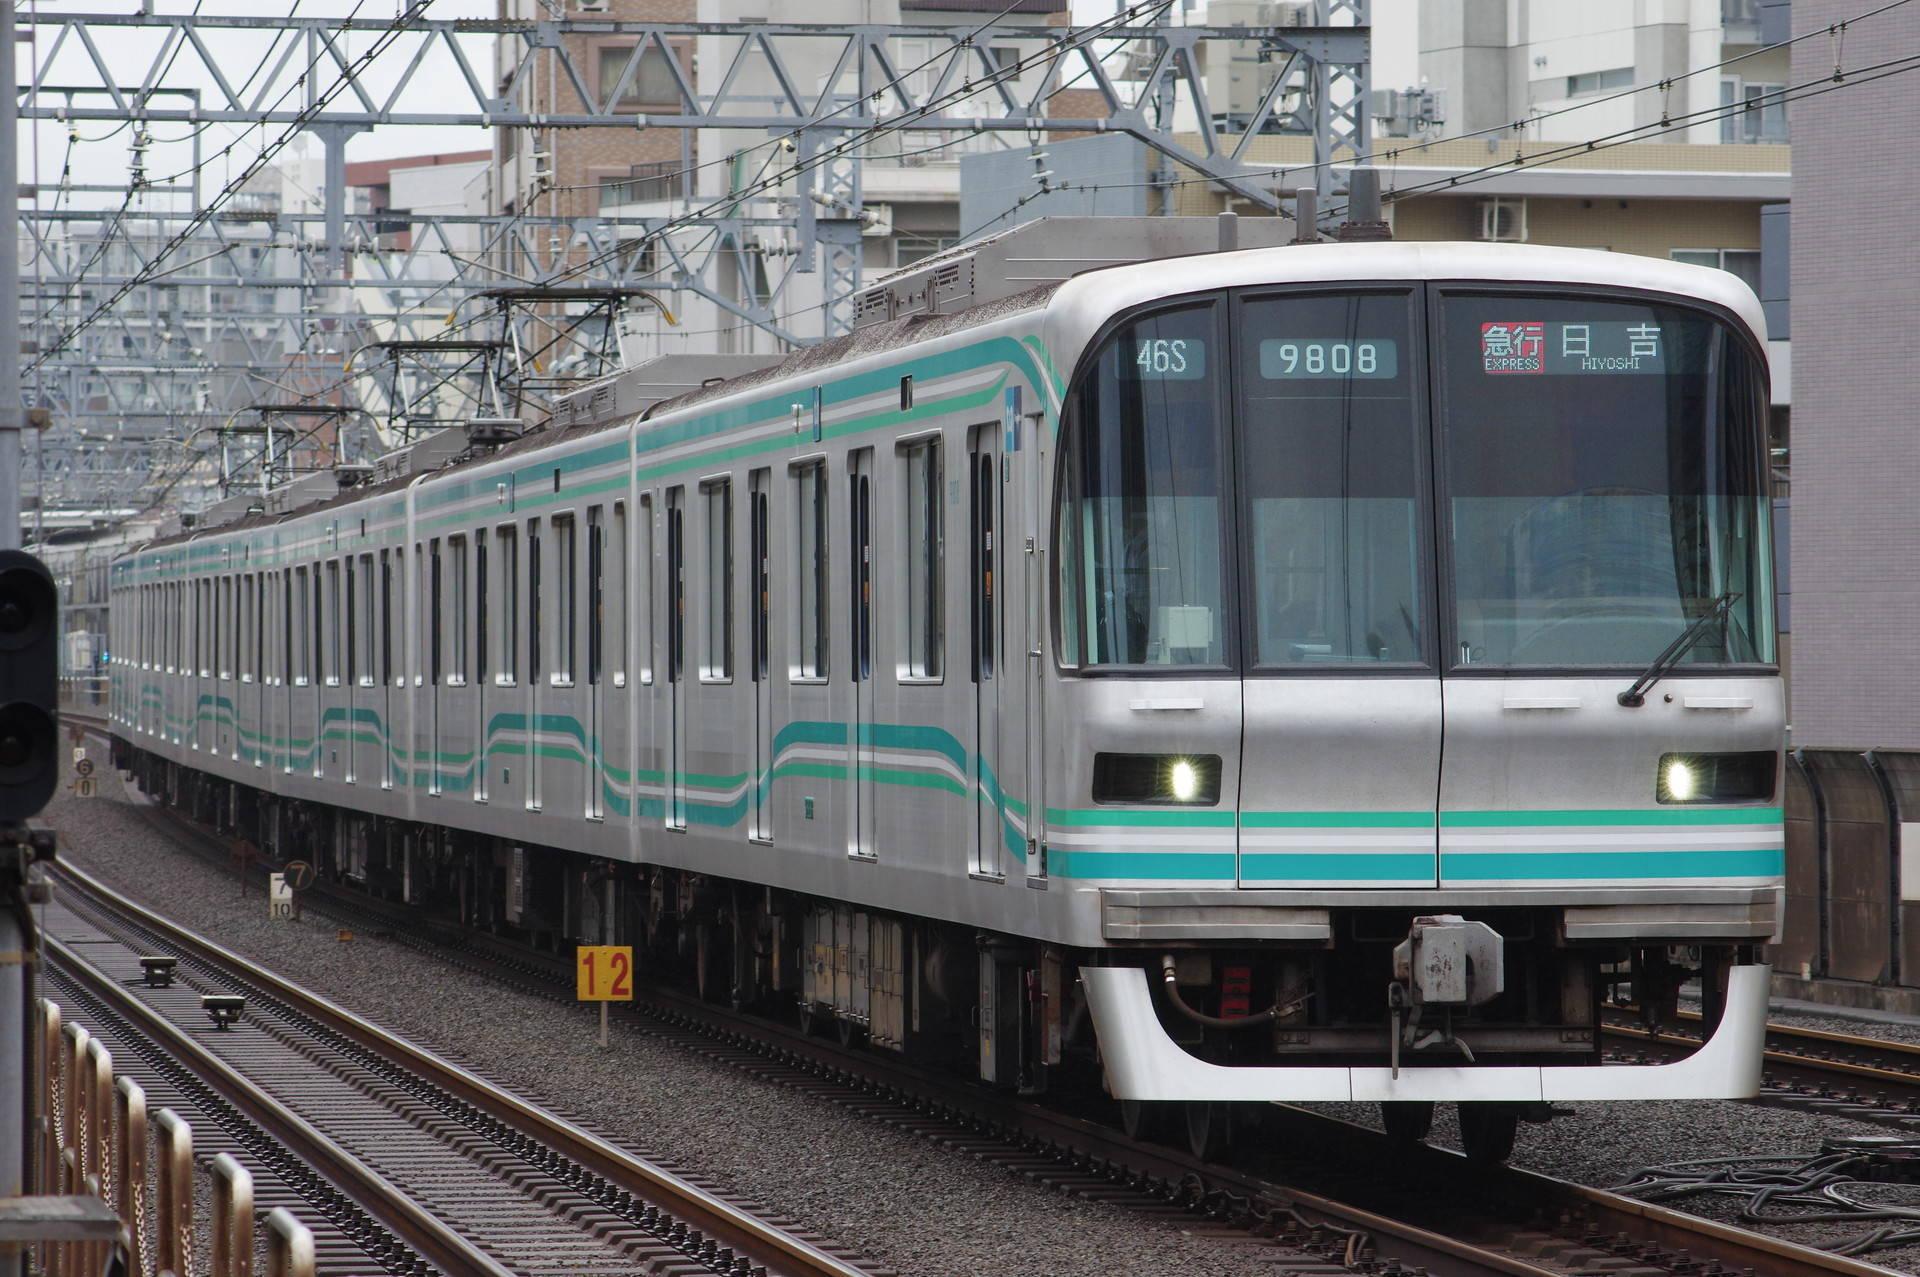 東京メトロ 9000系第08編成(B修車)